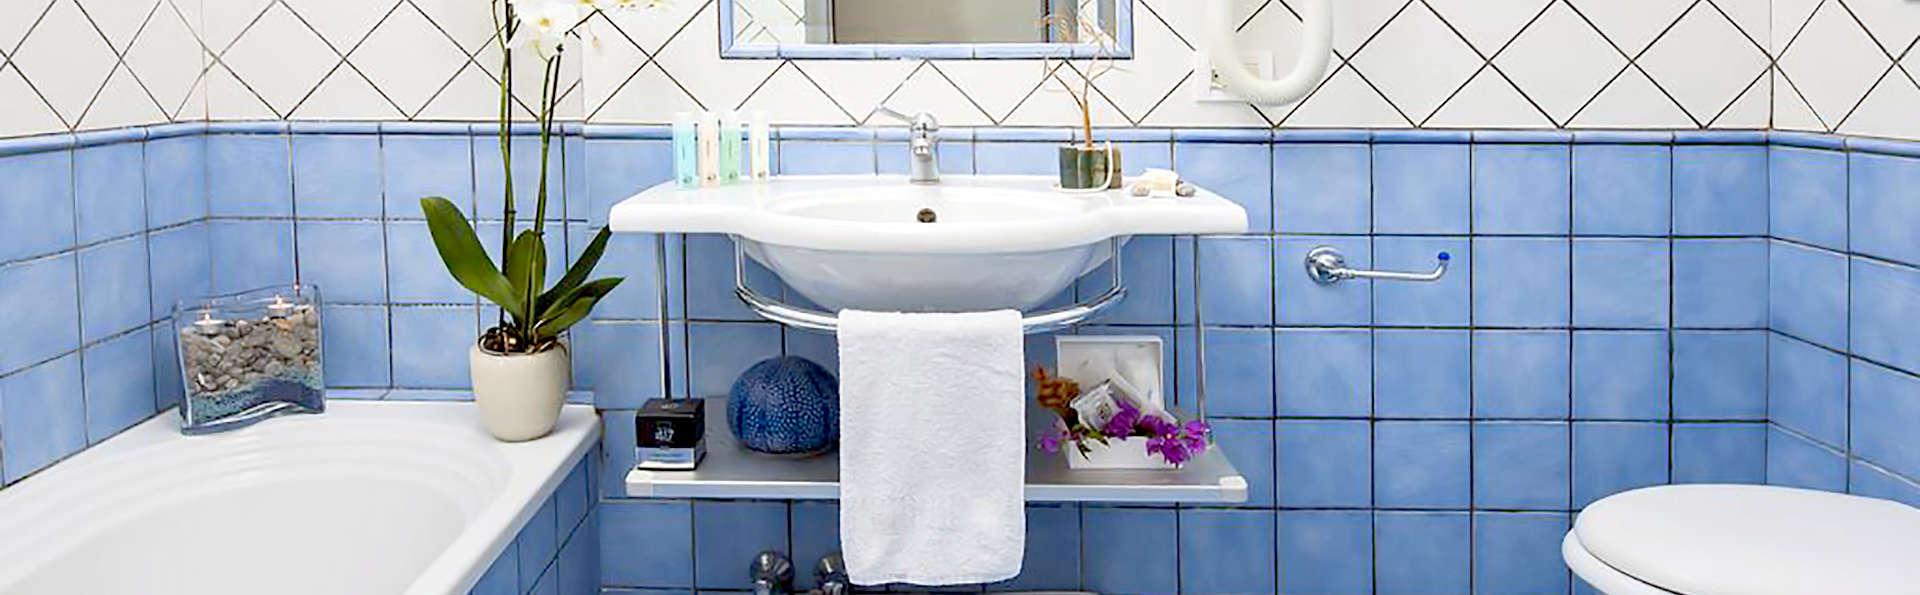 Hotel Pasitea - Edit_Bathroom2.jpg